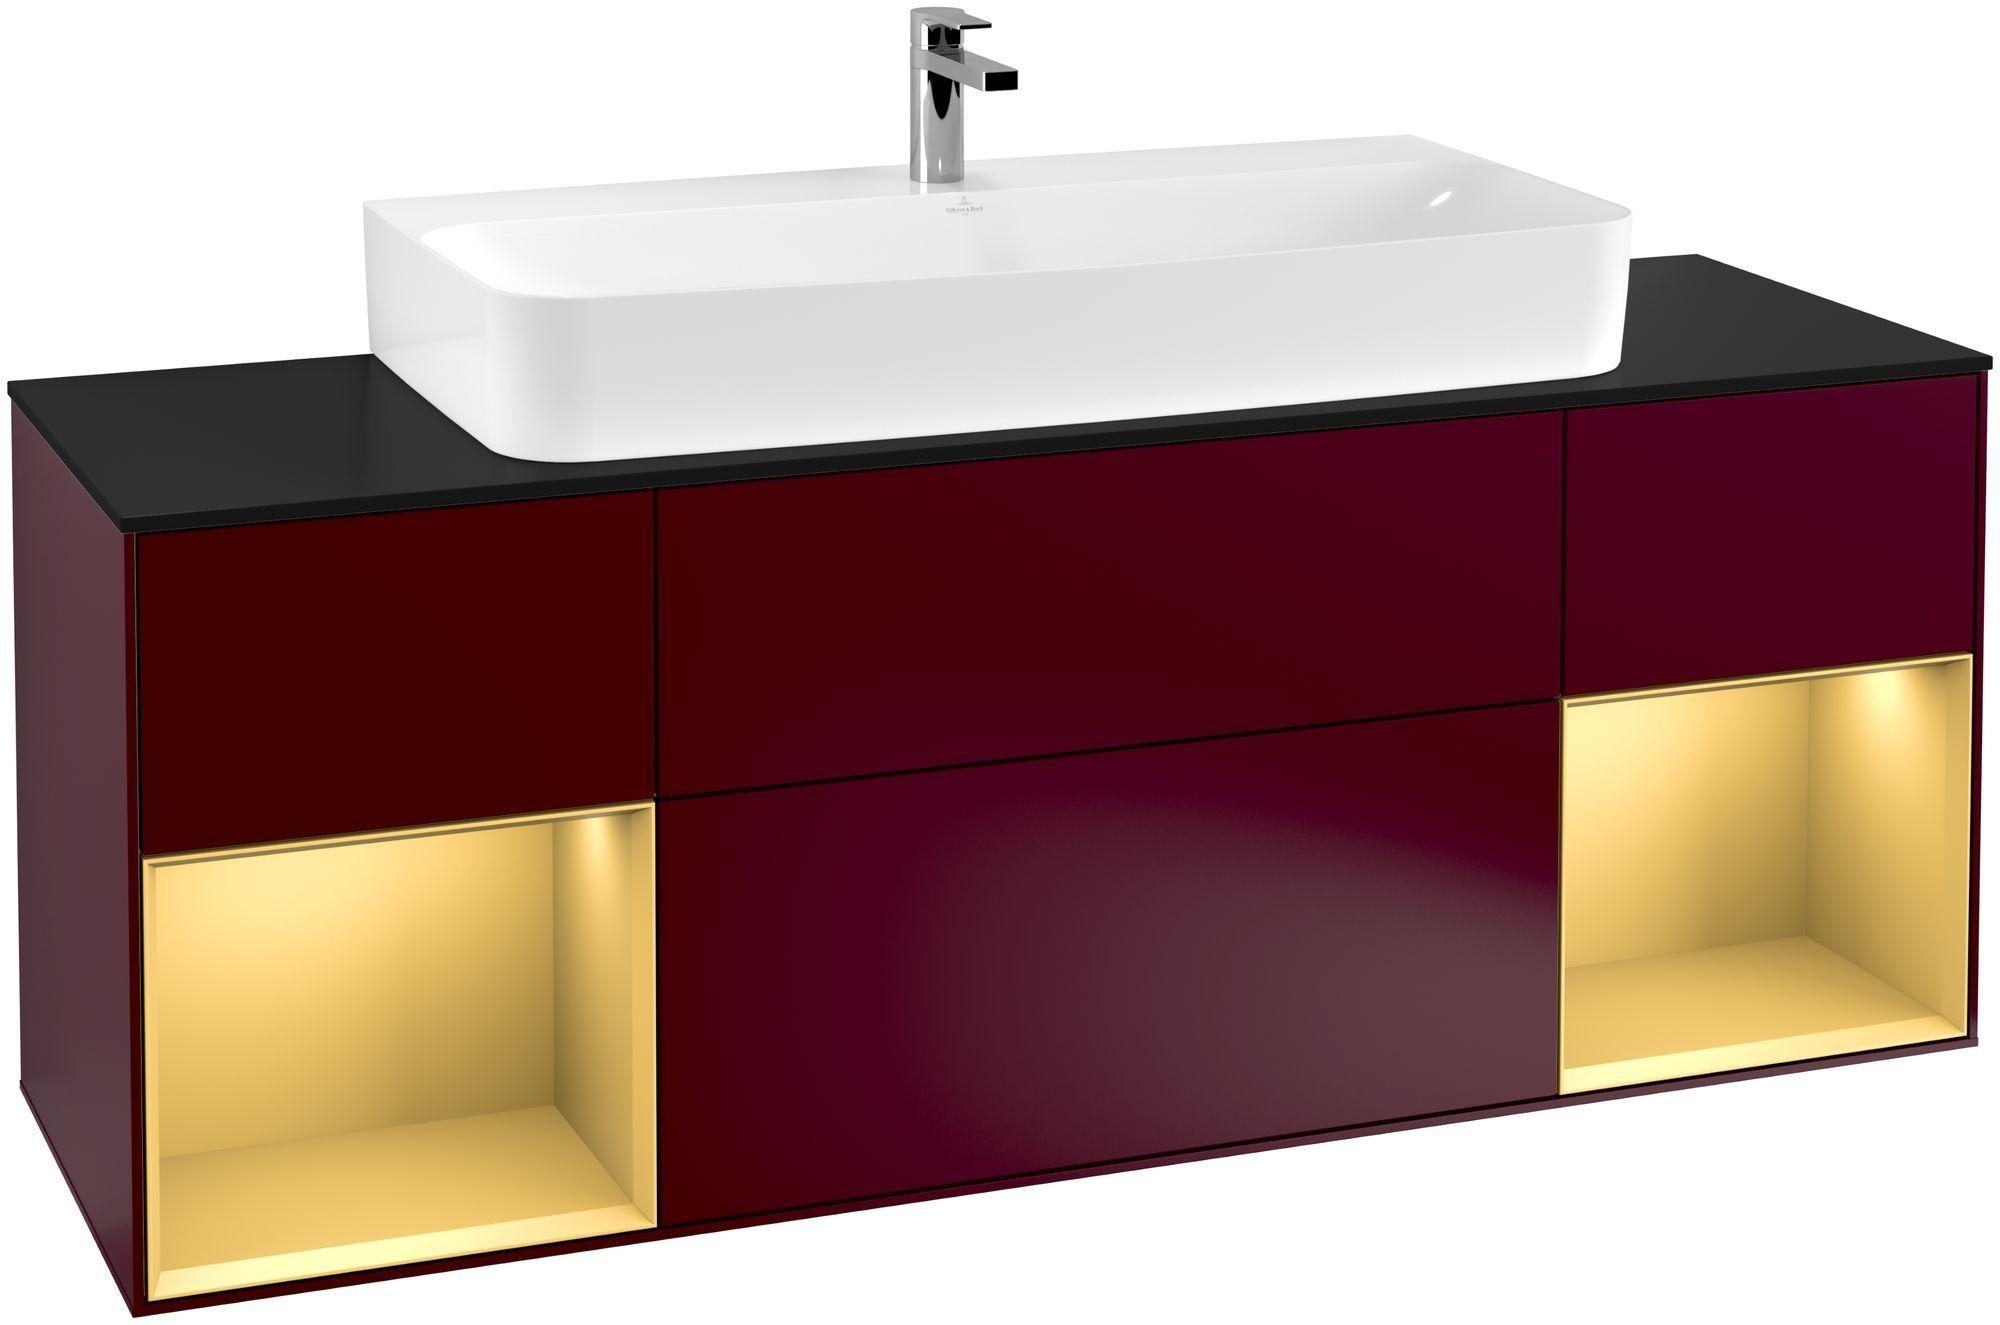 Villeroy & Boch Finion F21 Waschtischunterschrank mit Regalelement 4 Auszüge Waschtisch mittig LED-Beleuchtung B:160xH:60,3xT:50,1cm Front, Korpus: Peony, Regal: Gold Matt, Glasplatte: Black Matt F212HFHB